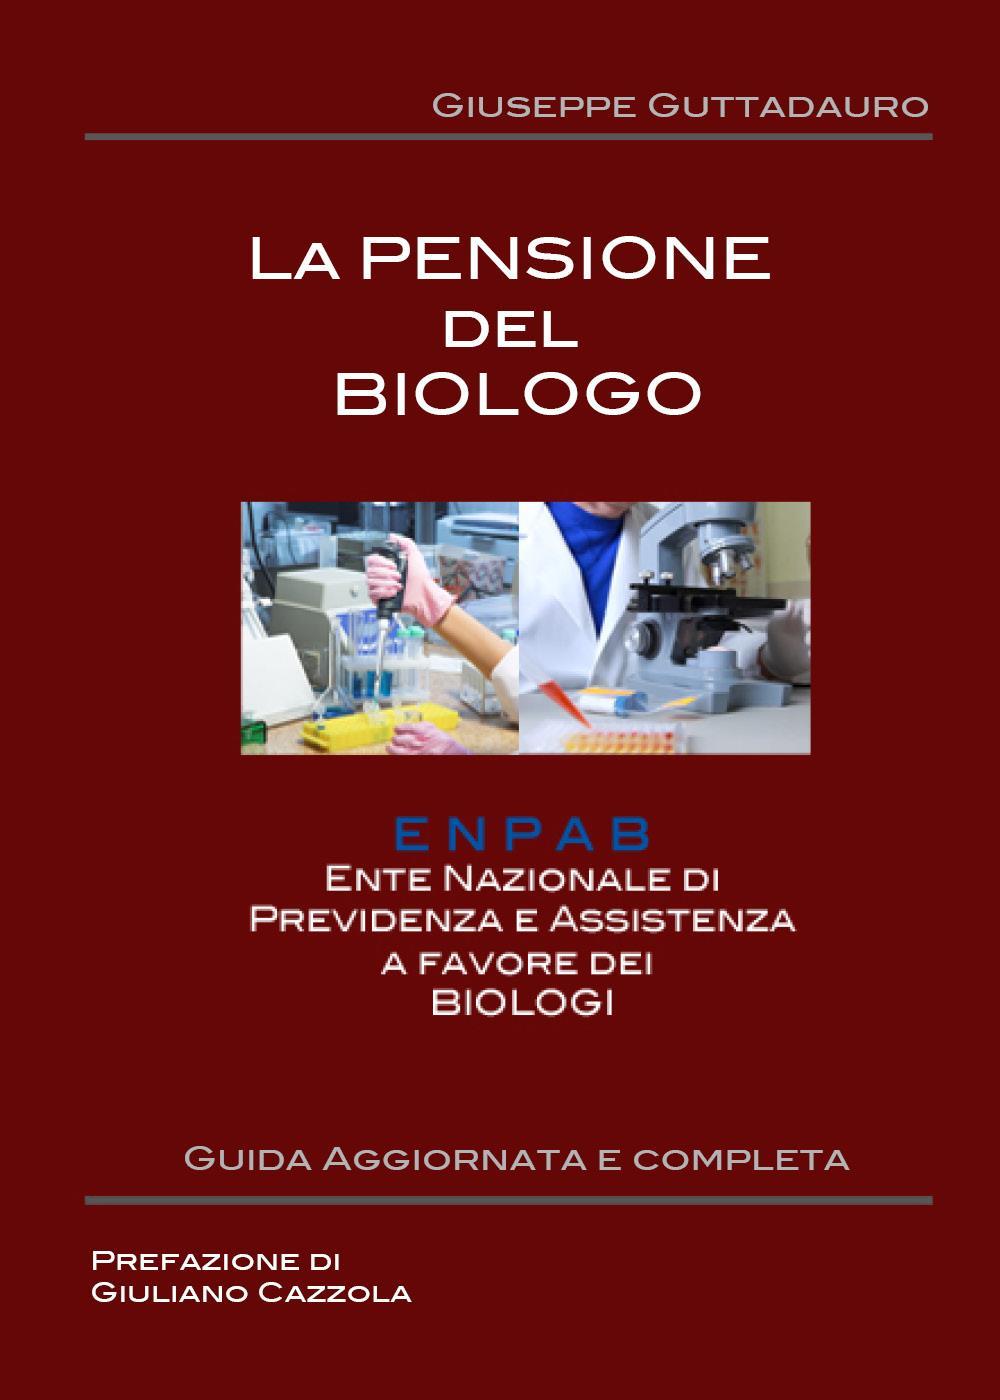 La Pensione del Biologo